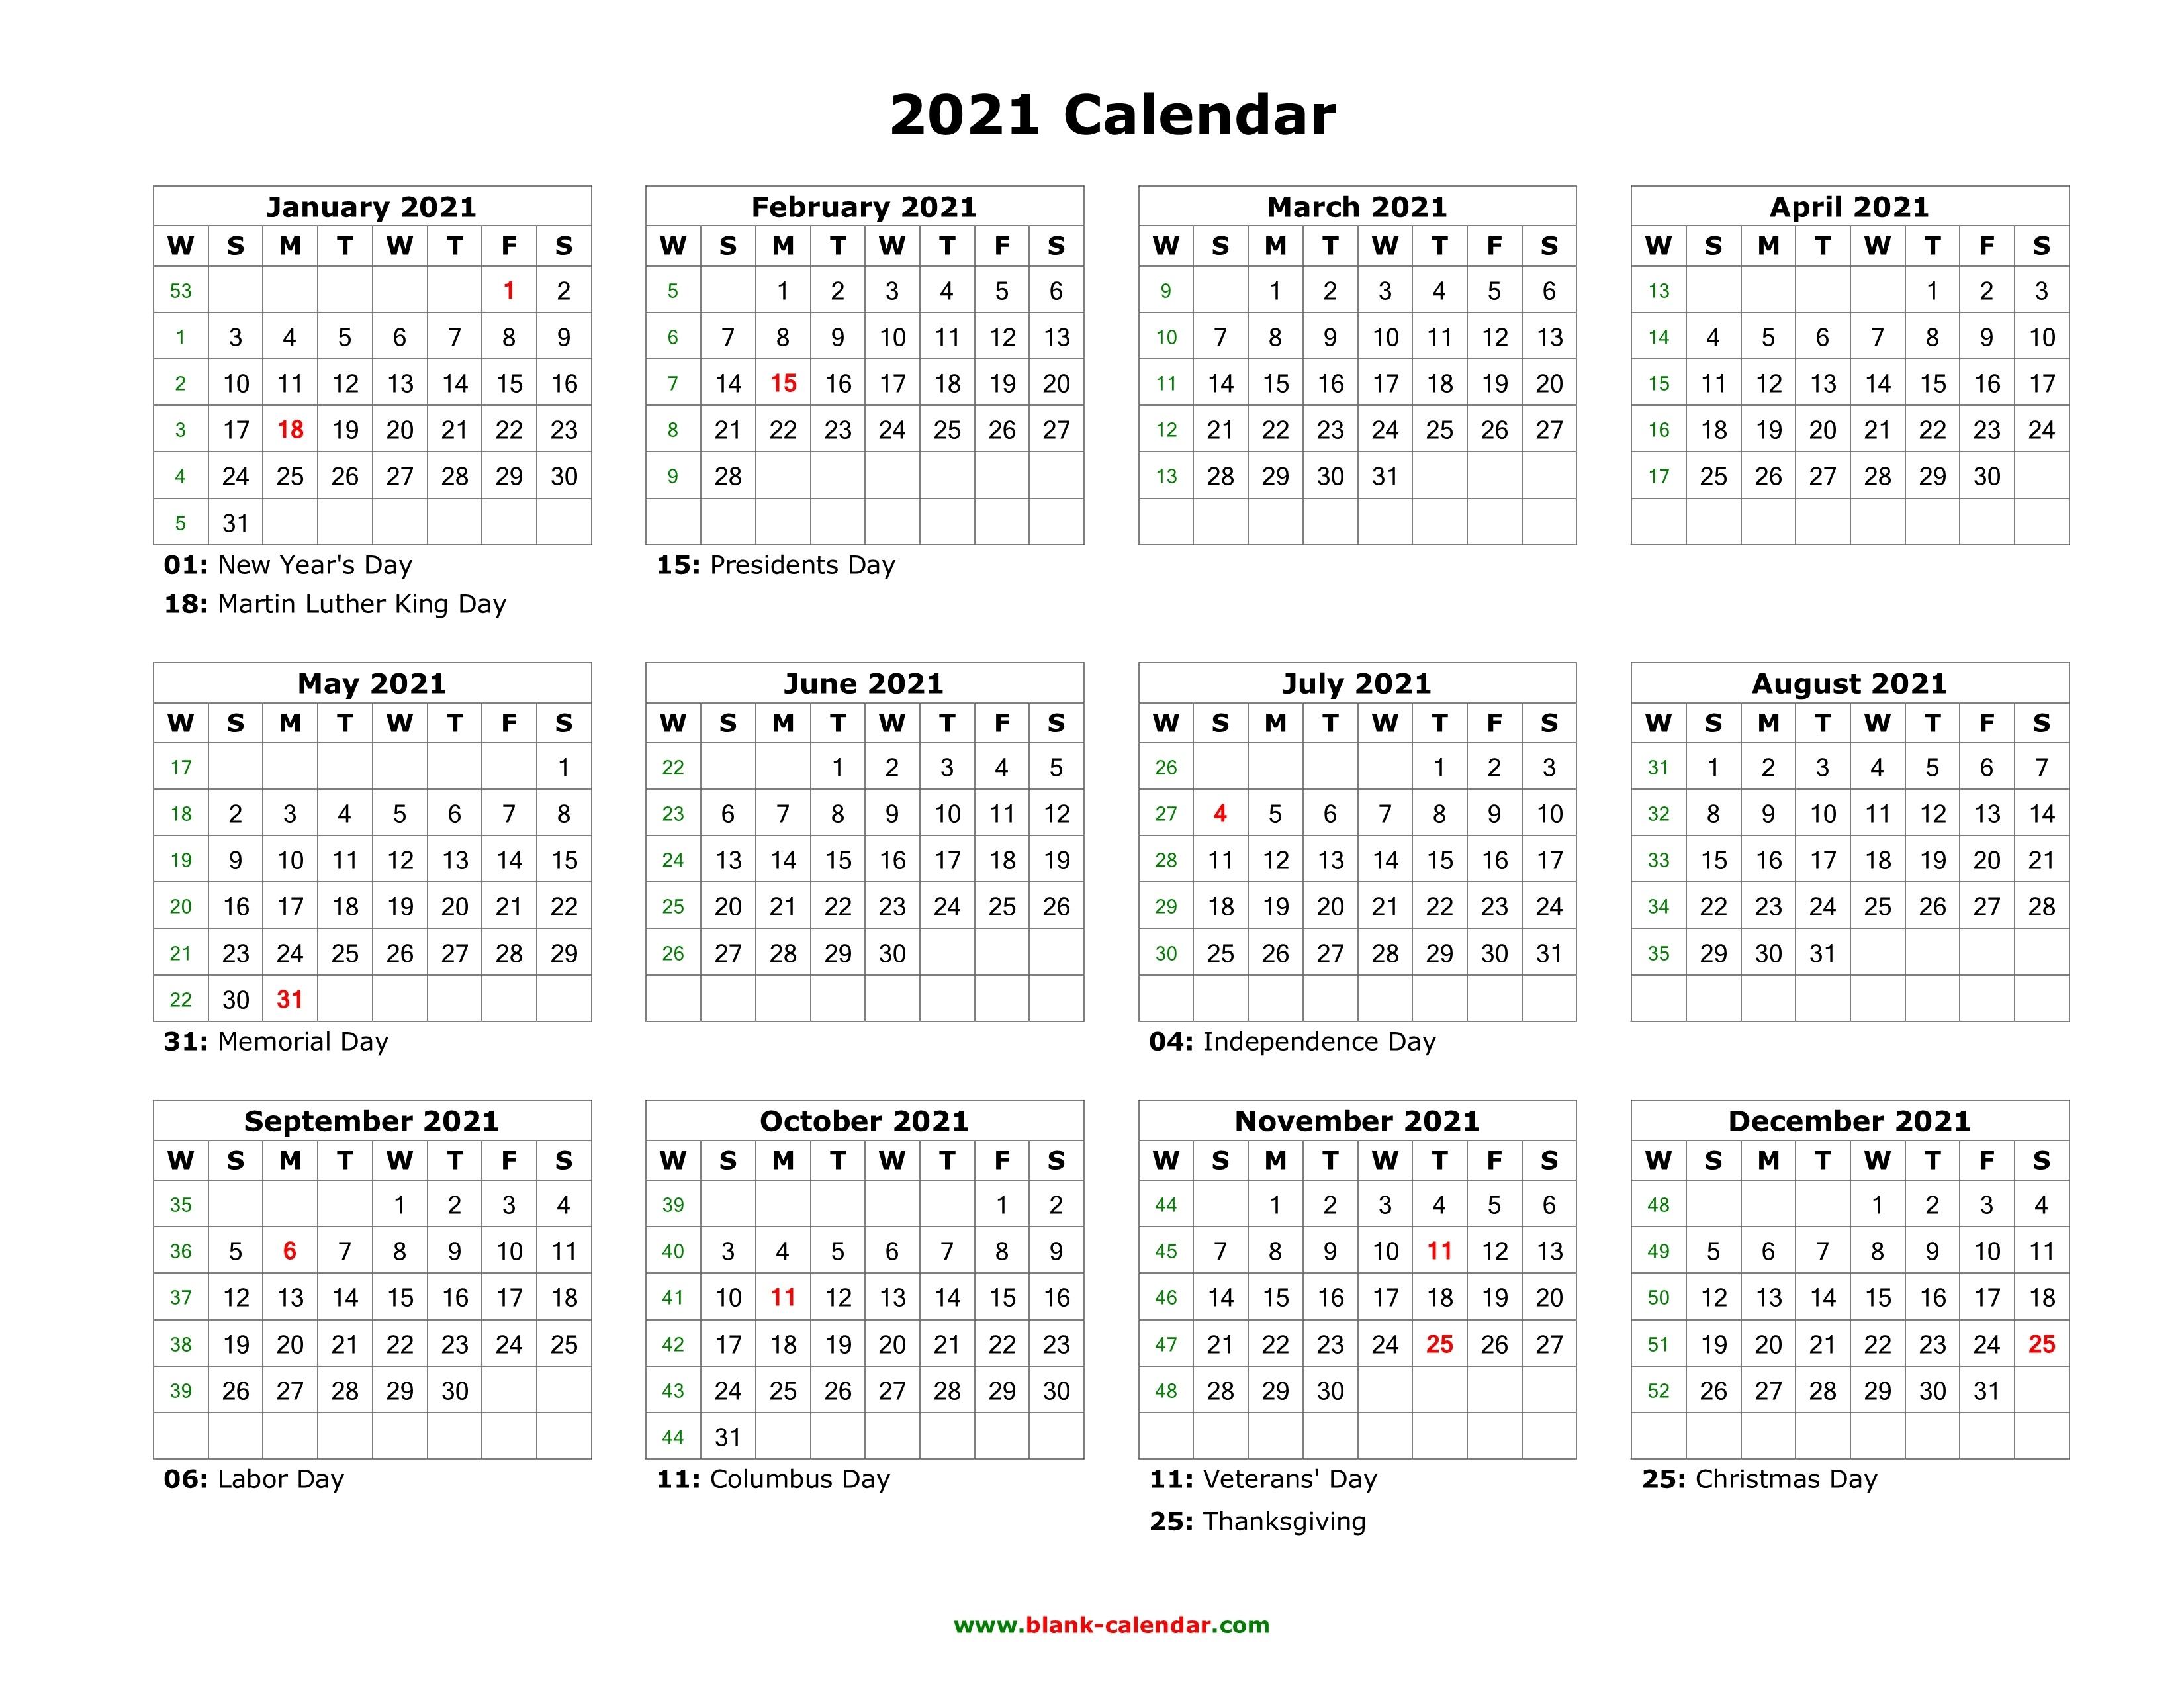 Blank Calendar 2021   Free Download Calendar Templates Free Calendars 2021 Word Doc Printable August